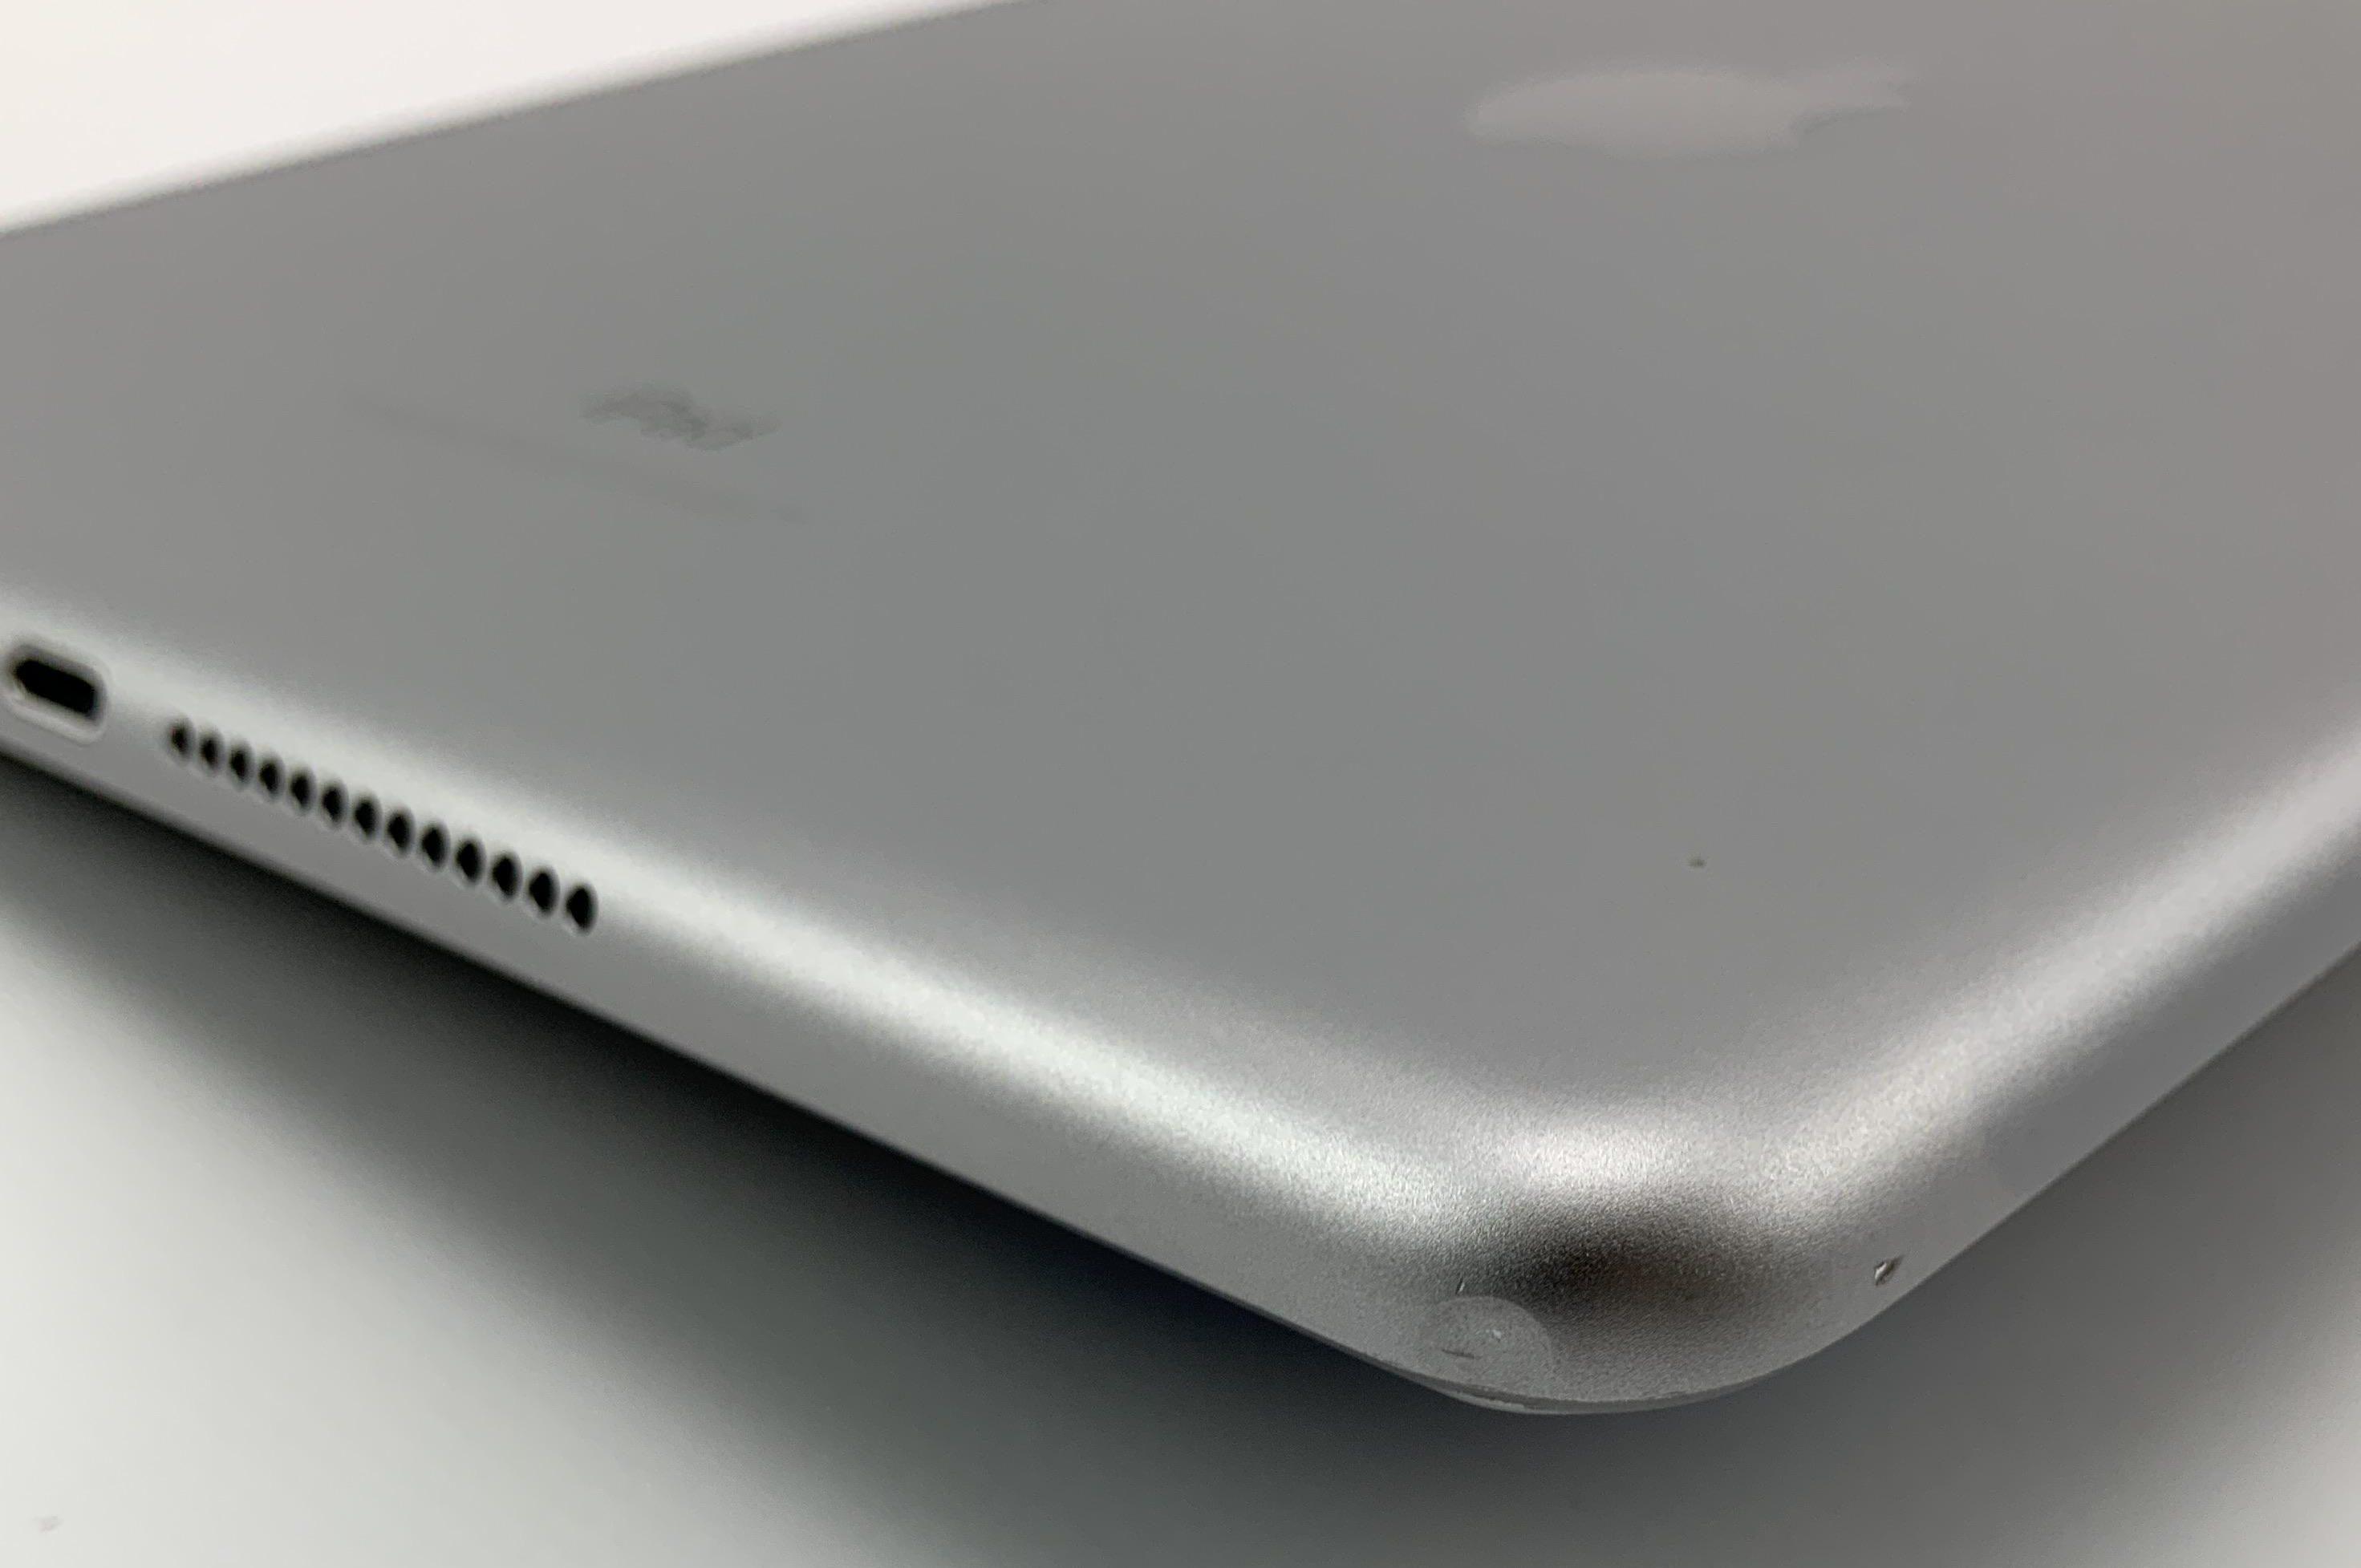 iPad 5 Wi-Fi 32GB, 32GB, Space Gray, Kuva 4